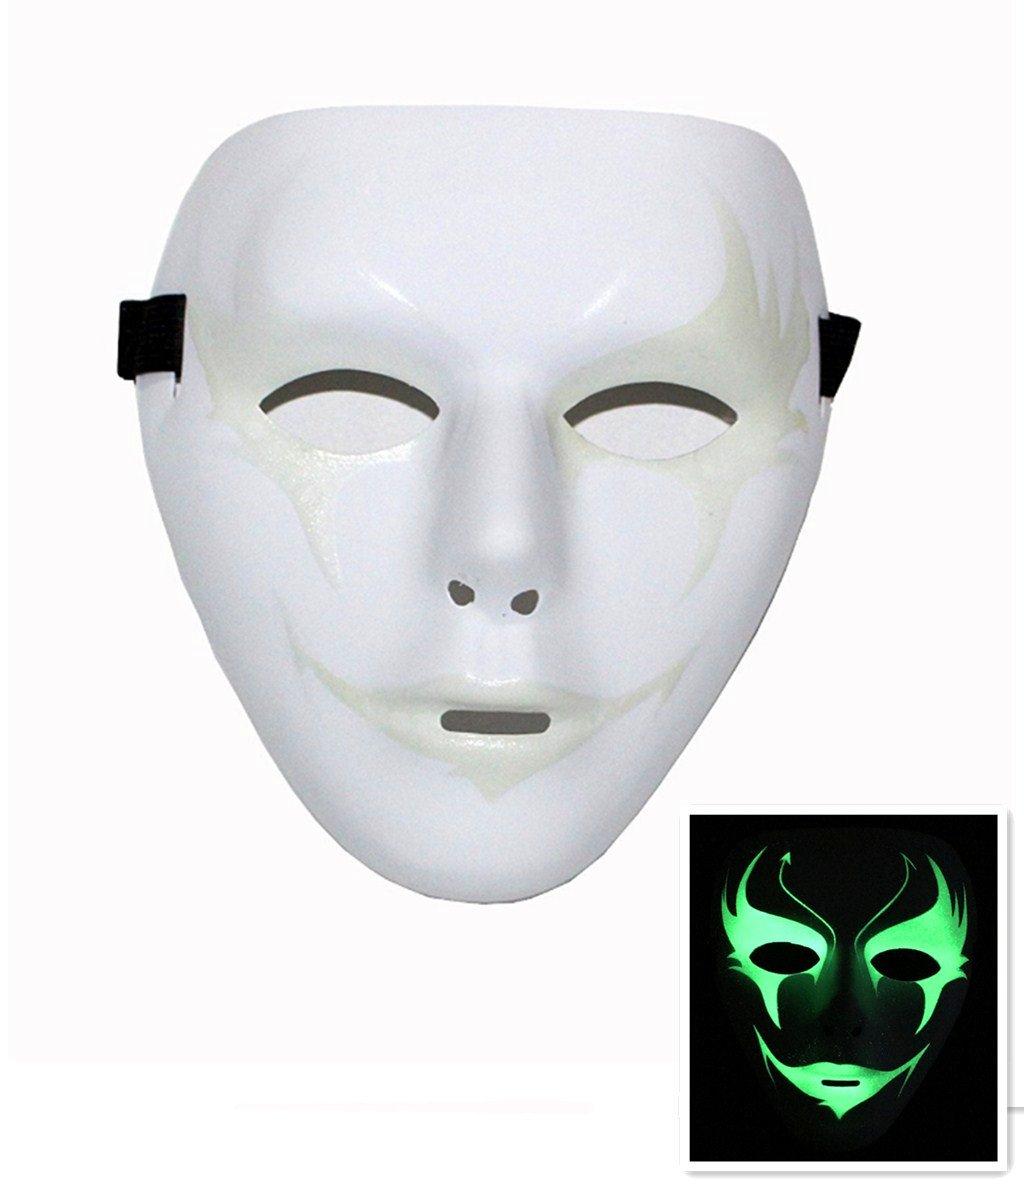 VStoy Halloween / Masquerade / maschera dipinta a mano bianca / maschera hip-hop / maschera horror / maschera luminosa (bianco)